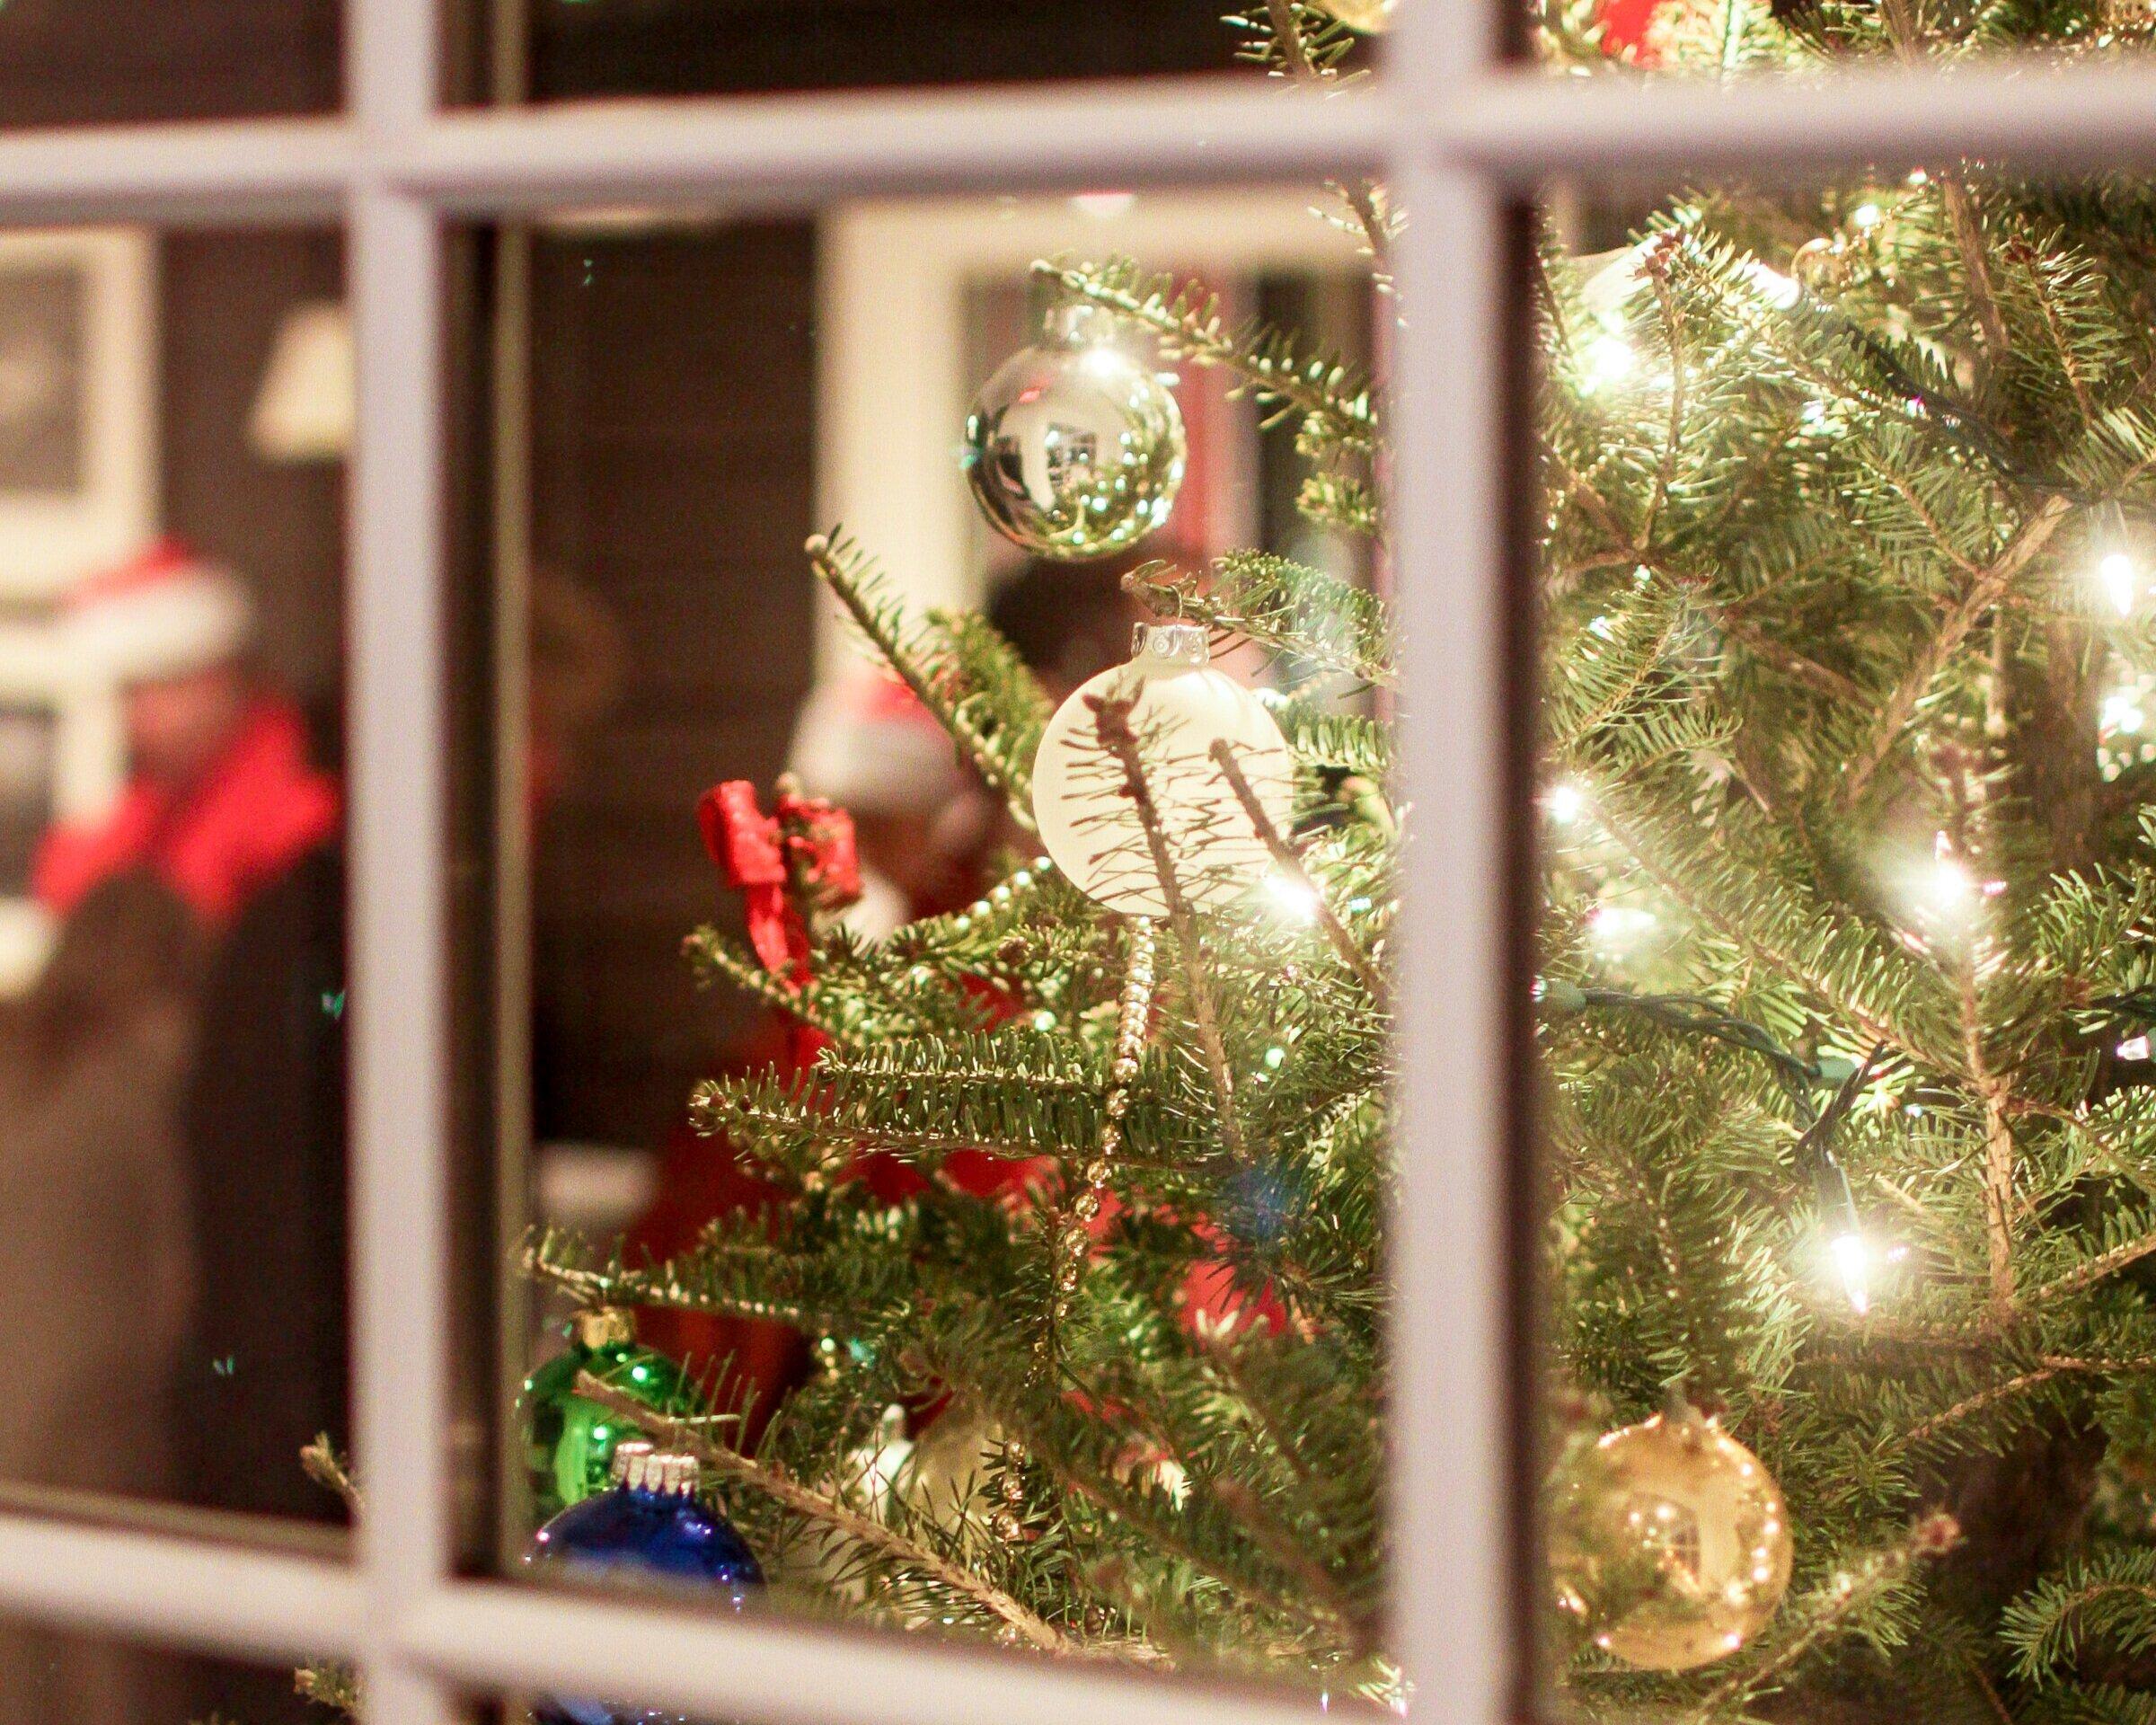 Dec 7 - The Maidstone Traditional Tree Lighting Ceremony